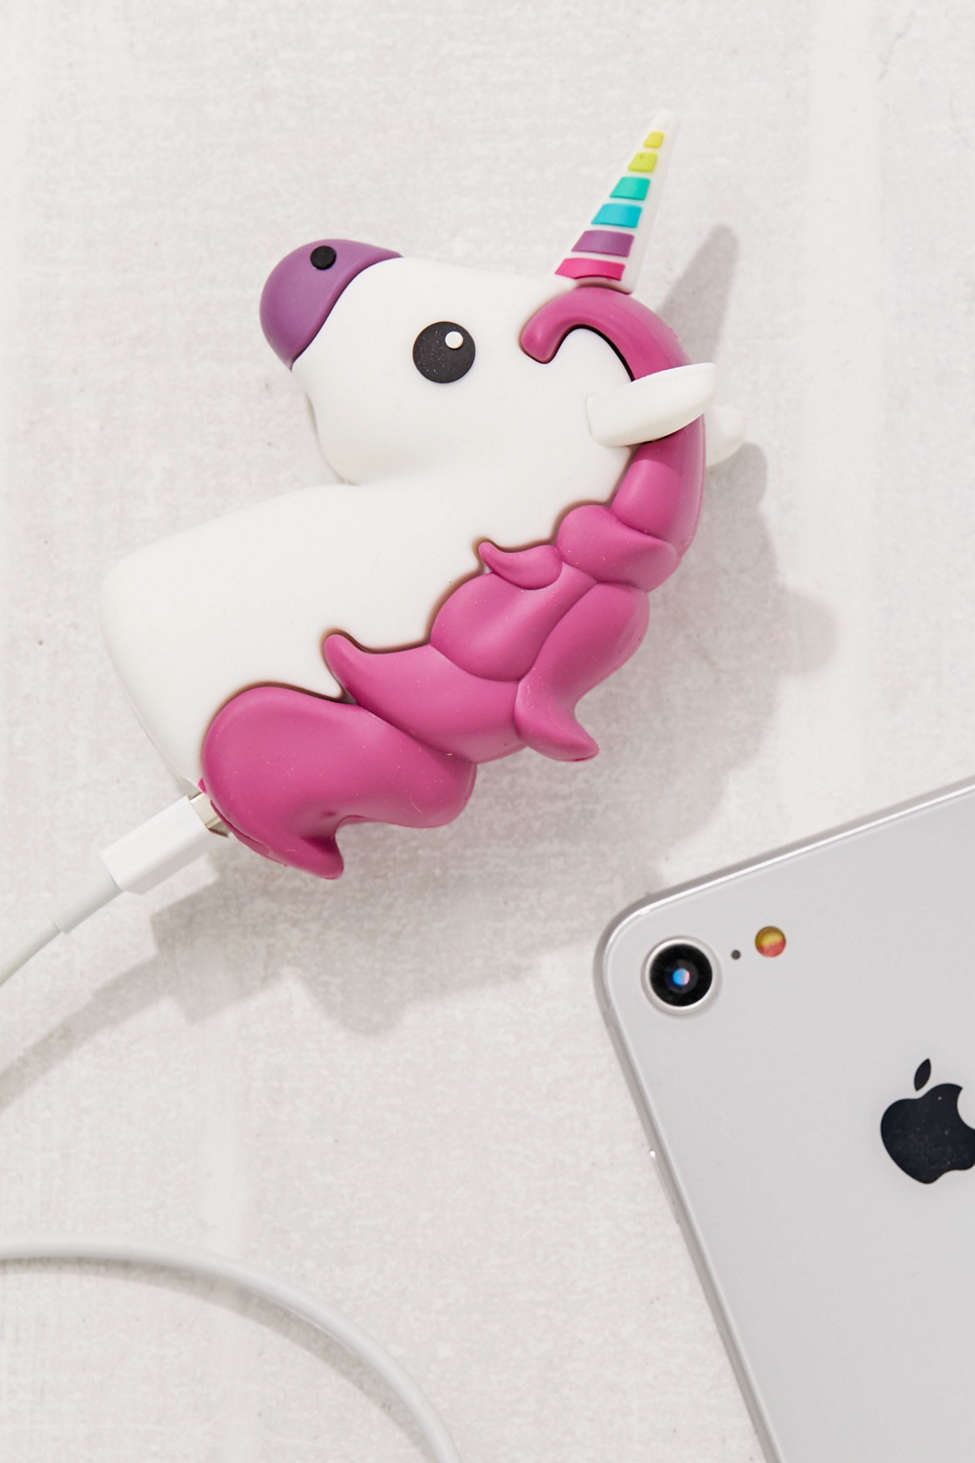 Slide View: 1: MojiPower Unicorn Portable Power Bank